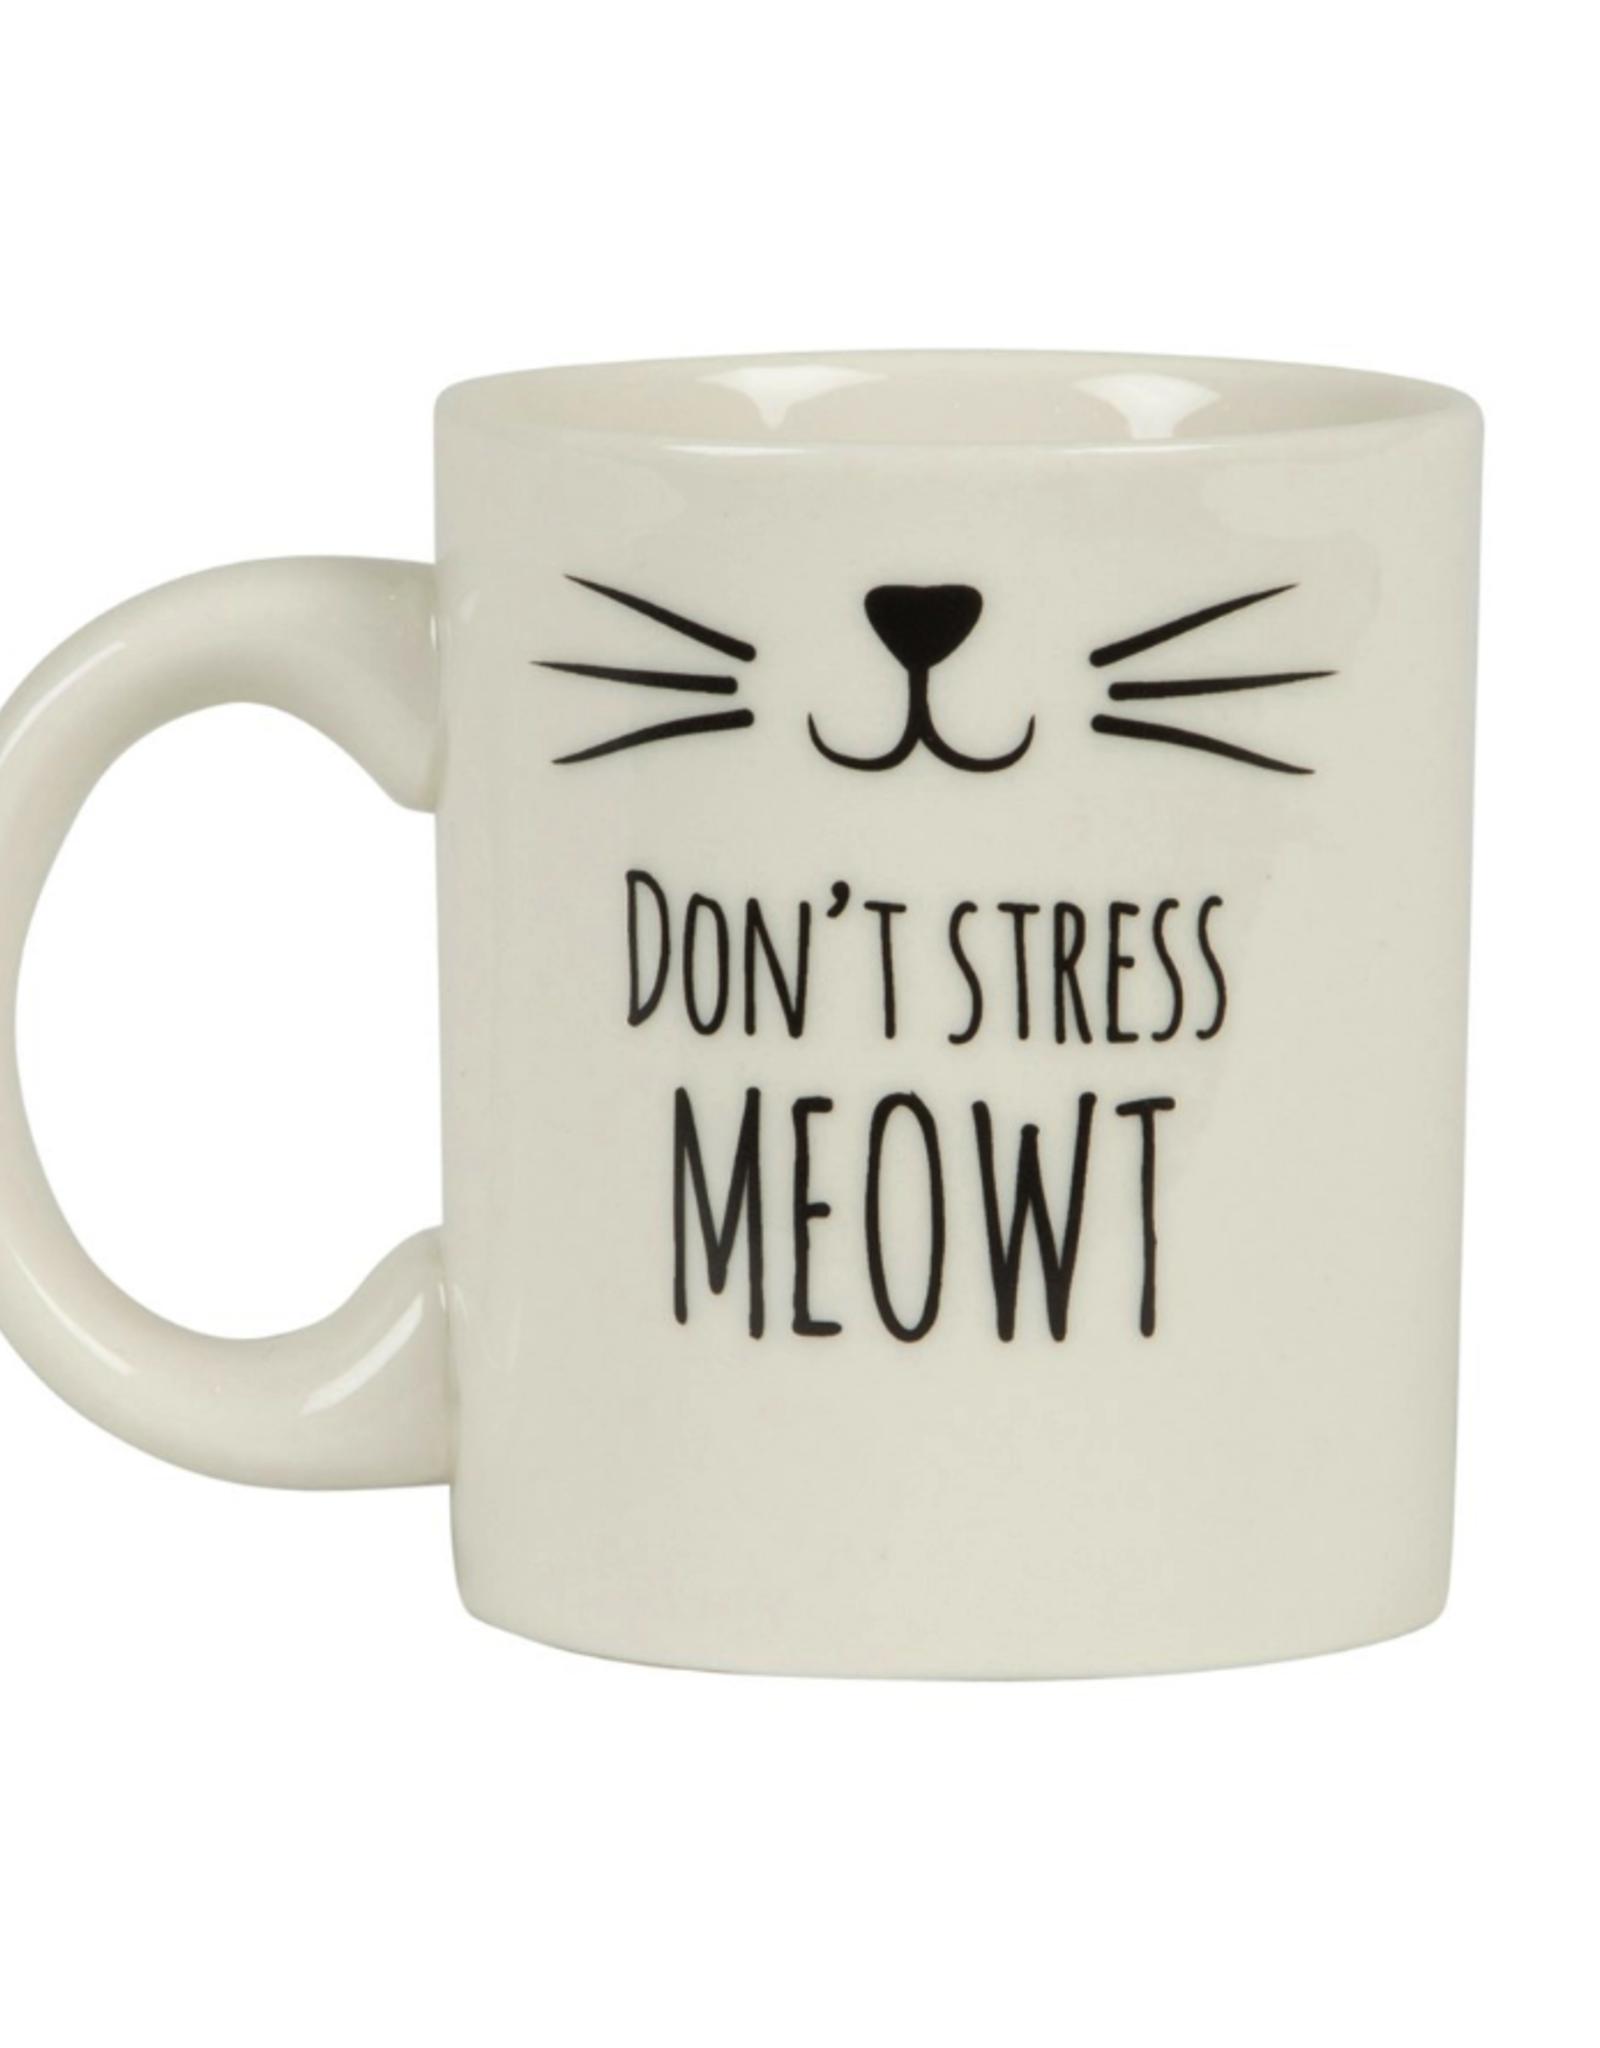 Sass & Belle Sass & Belle Cat's Whiksers don't stress meowt mok